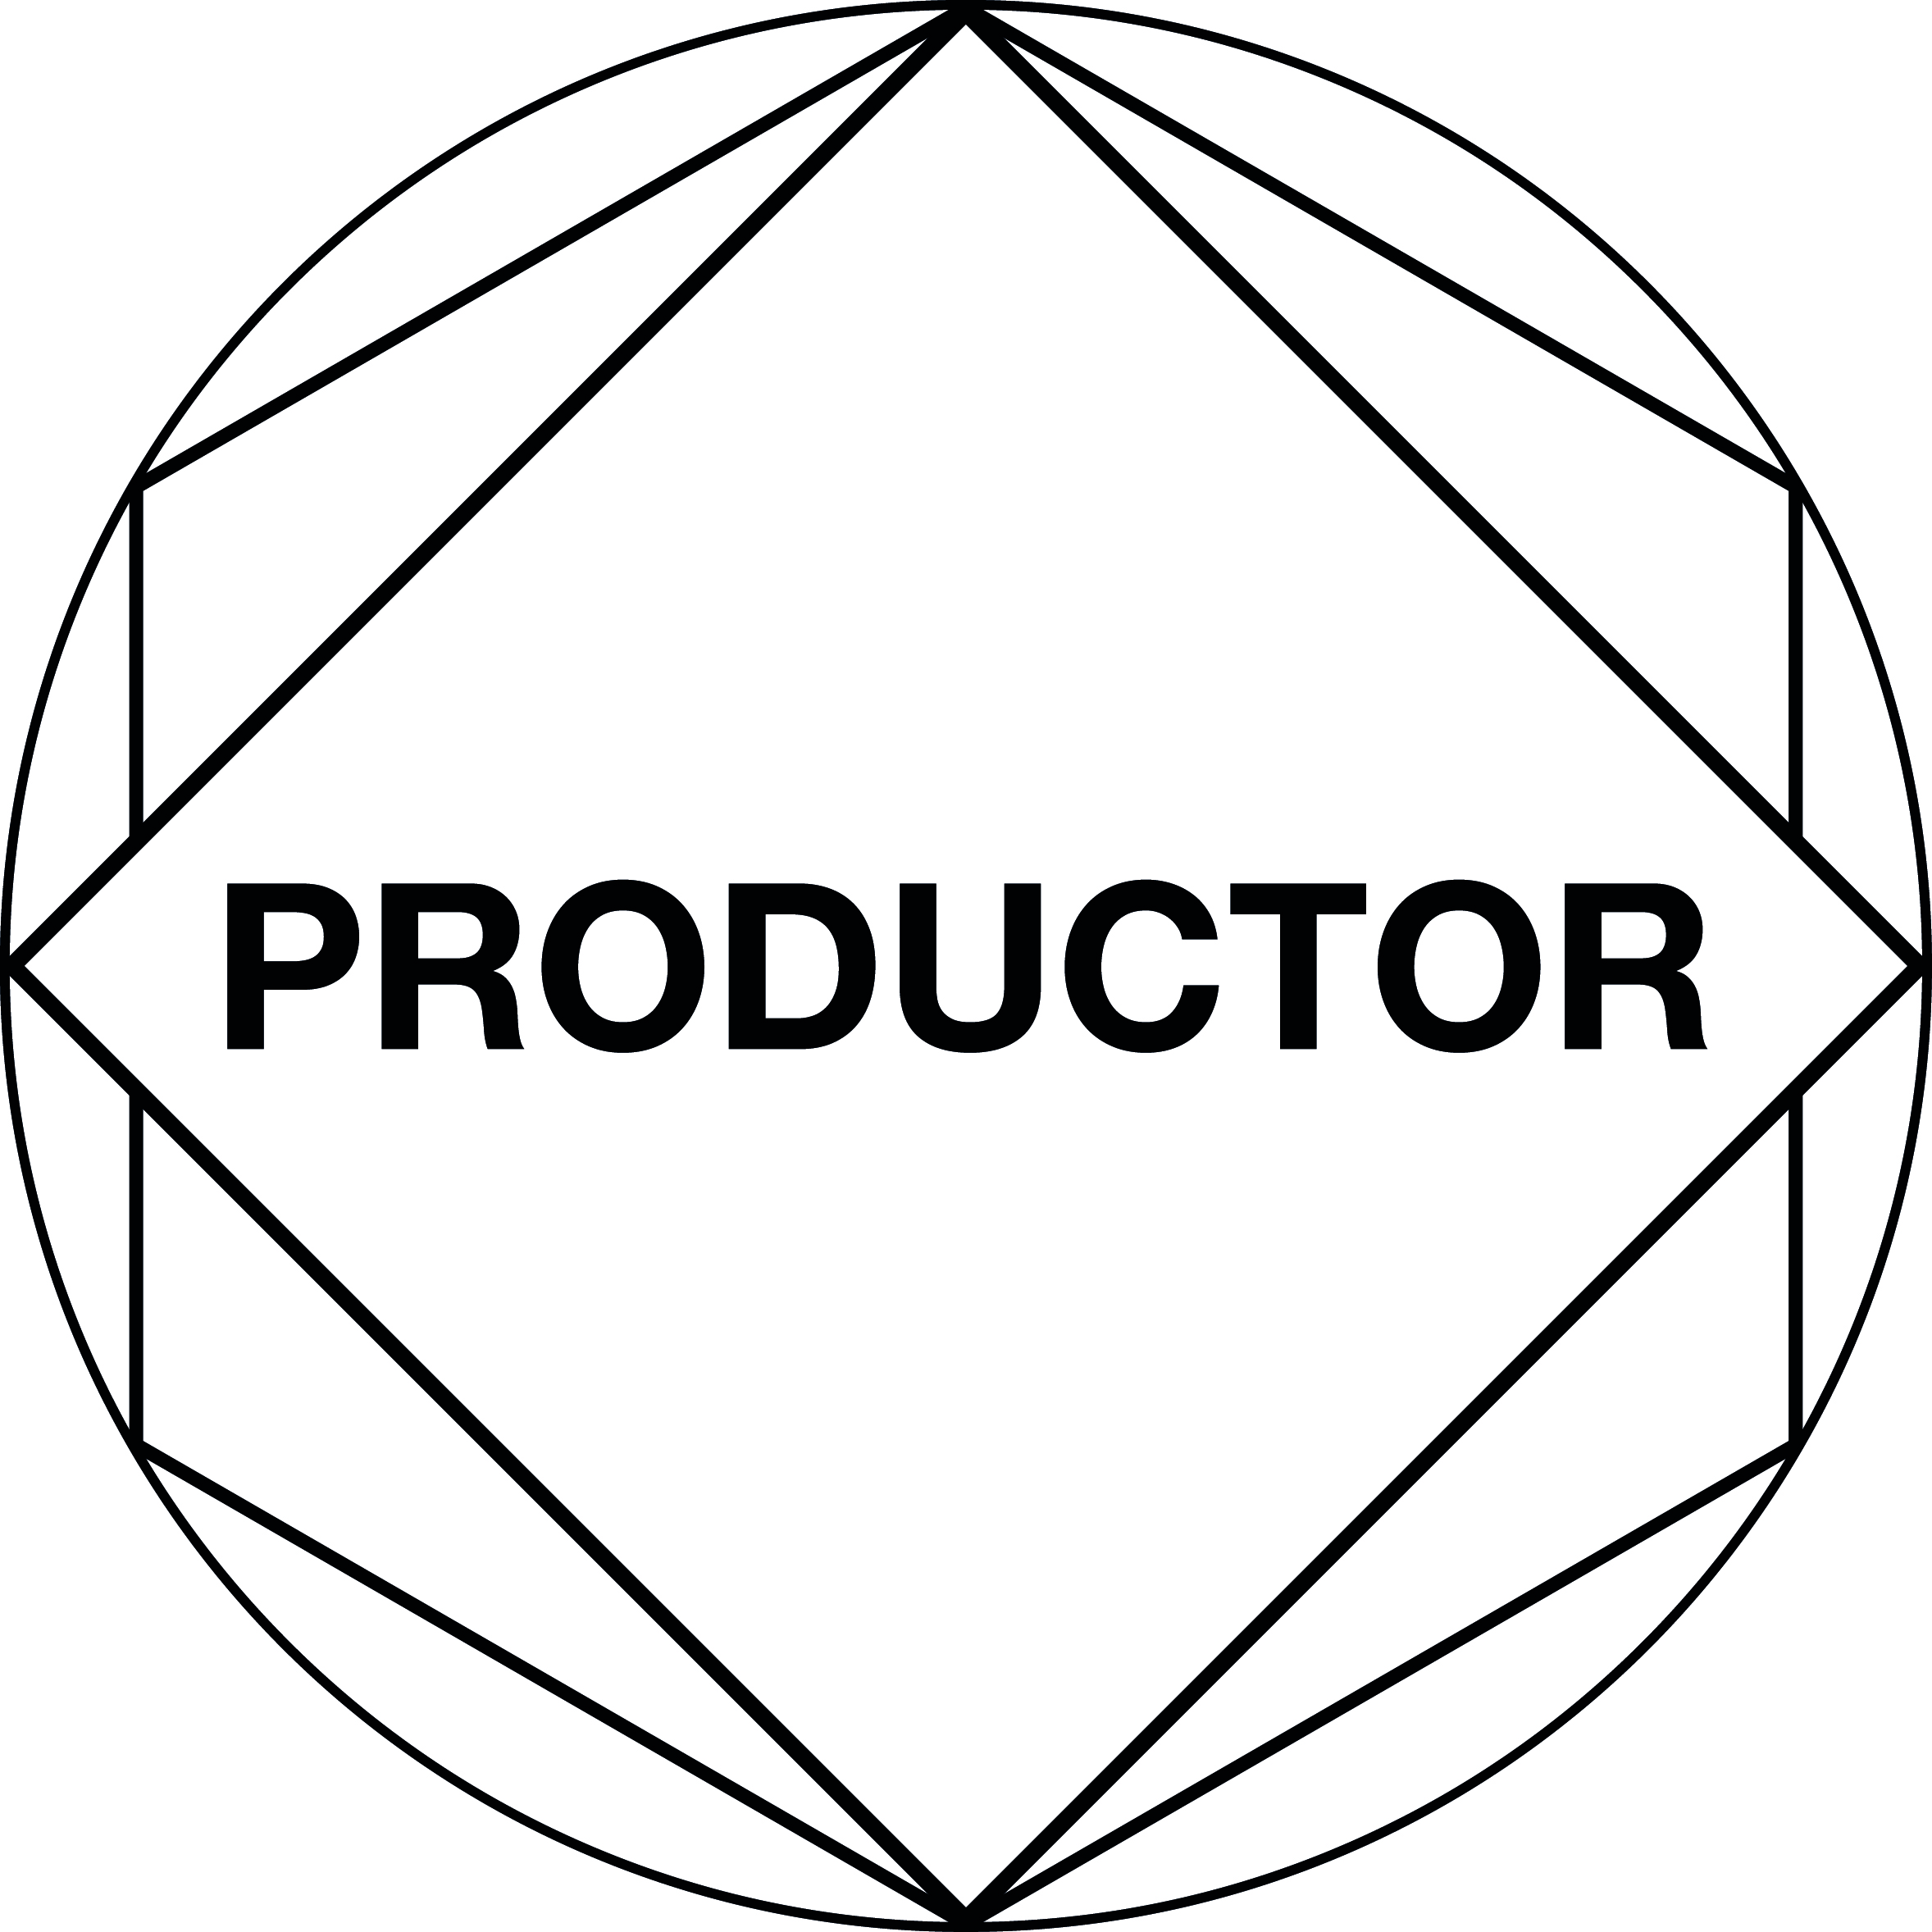 PRODUCTOR_LOGO (3).jpg